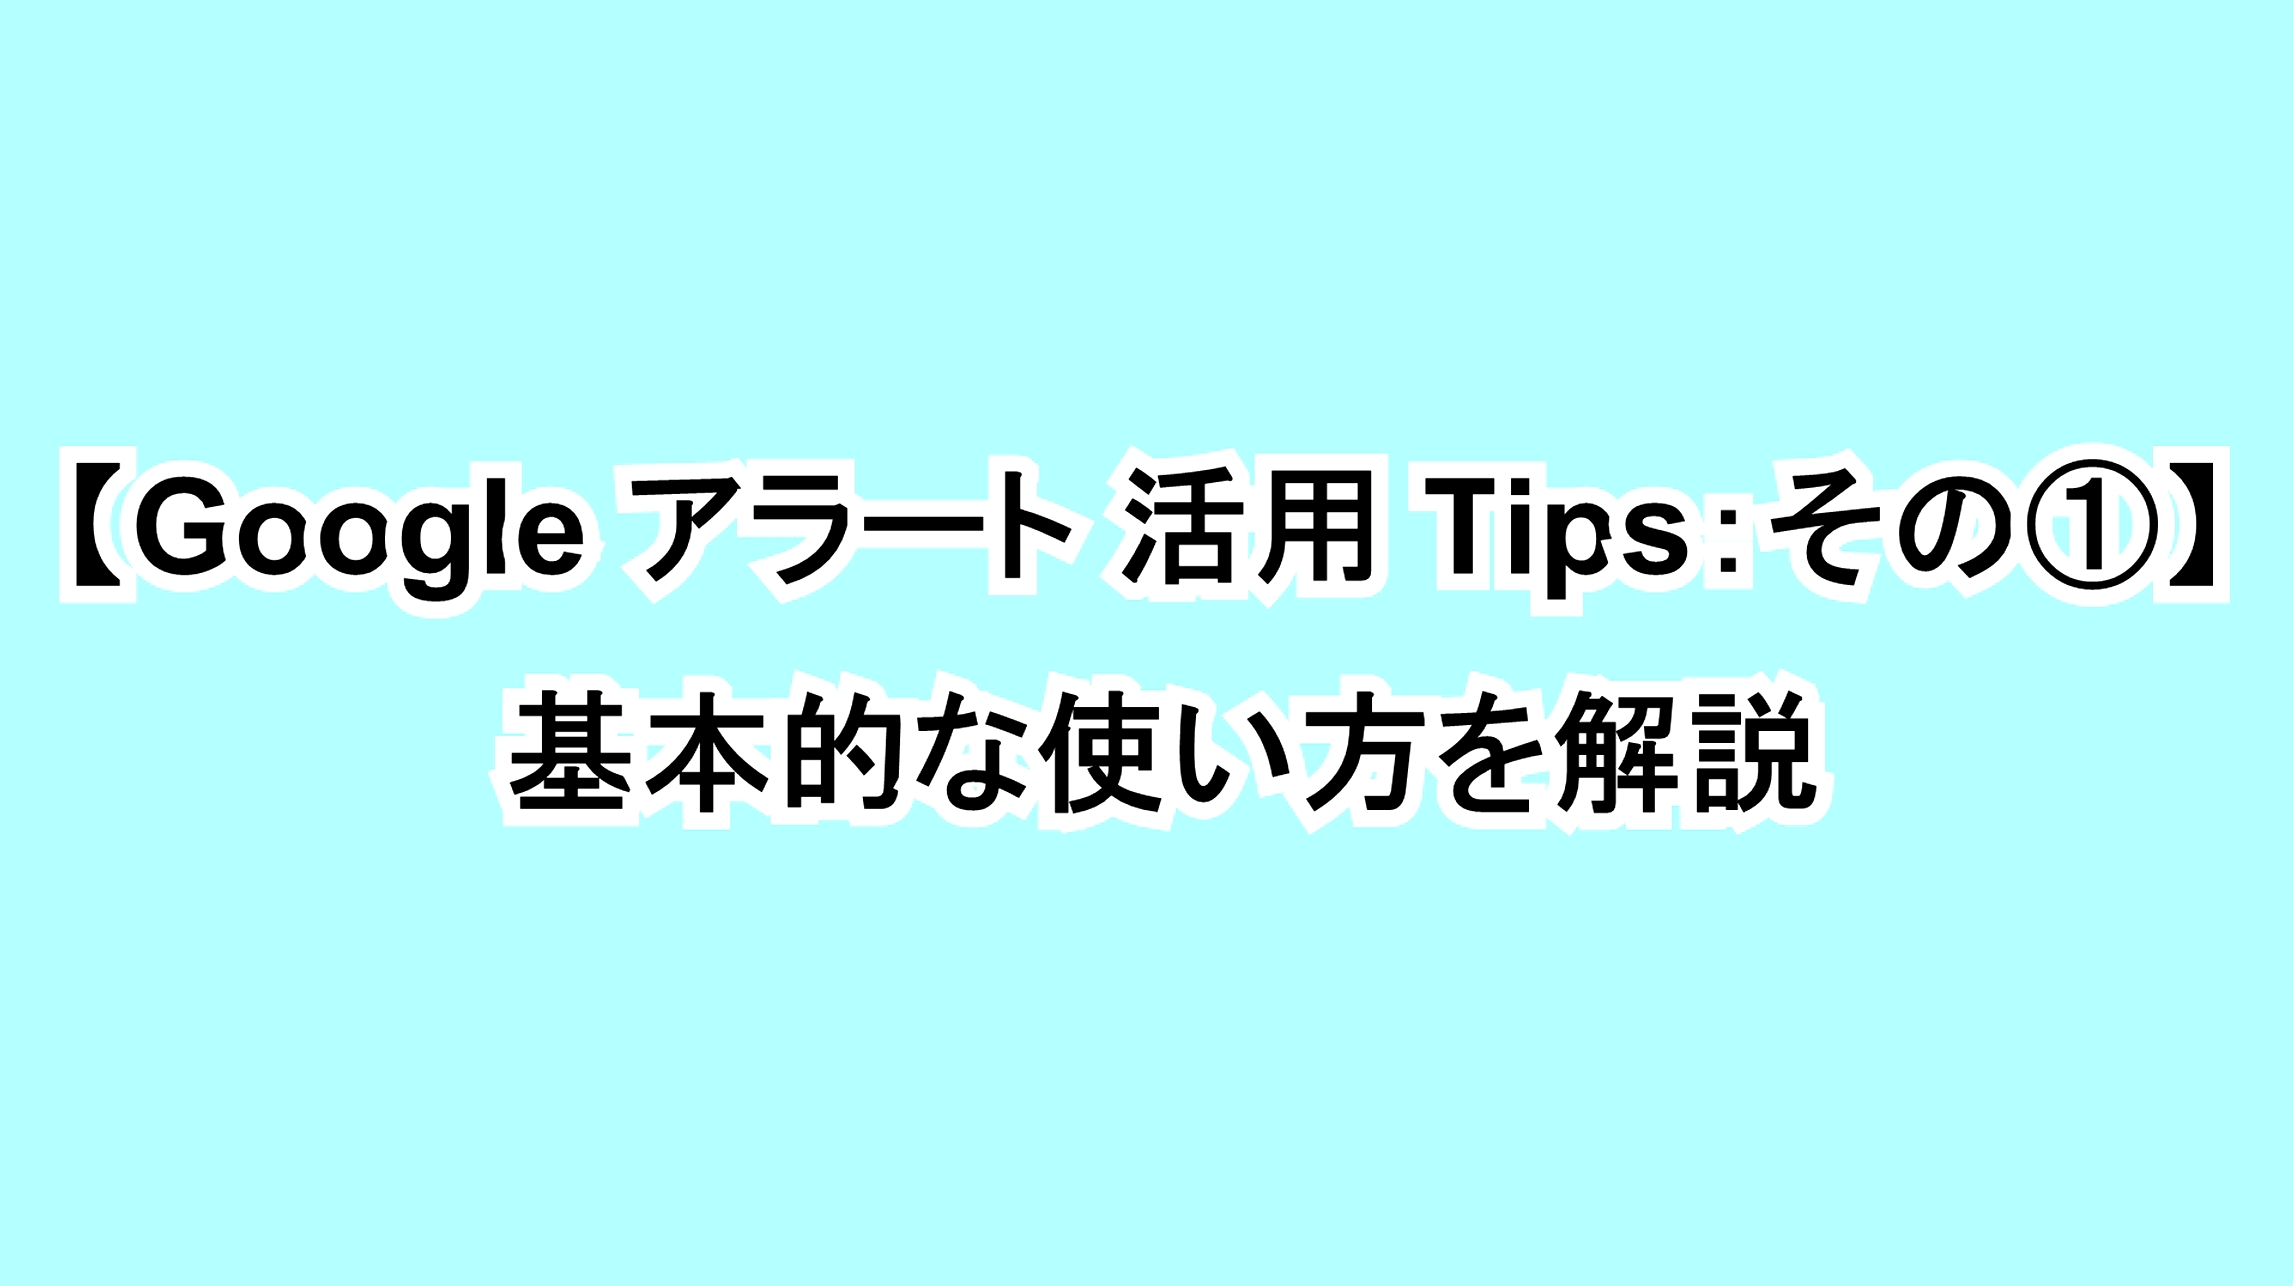 【Googleアラート活用Tips:その①】基本的な使い方を解説